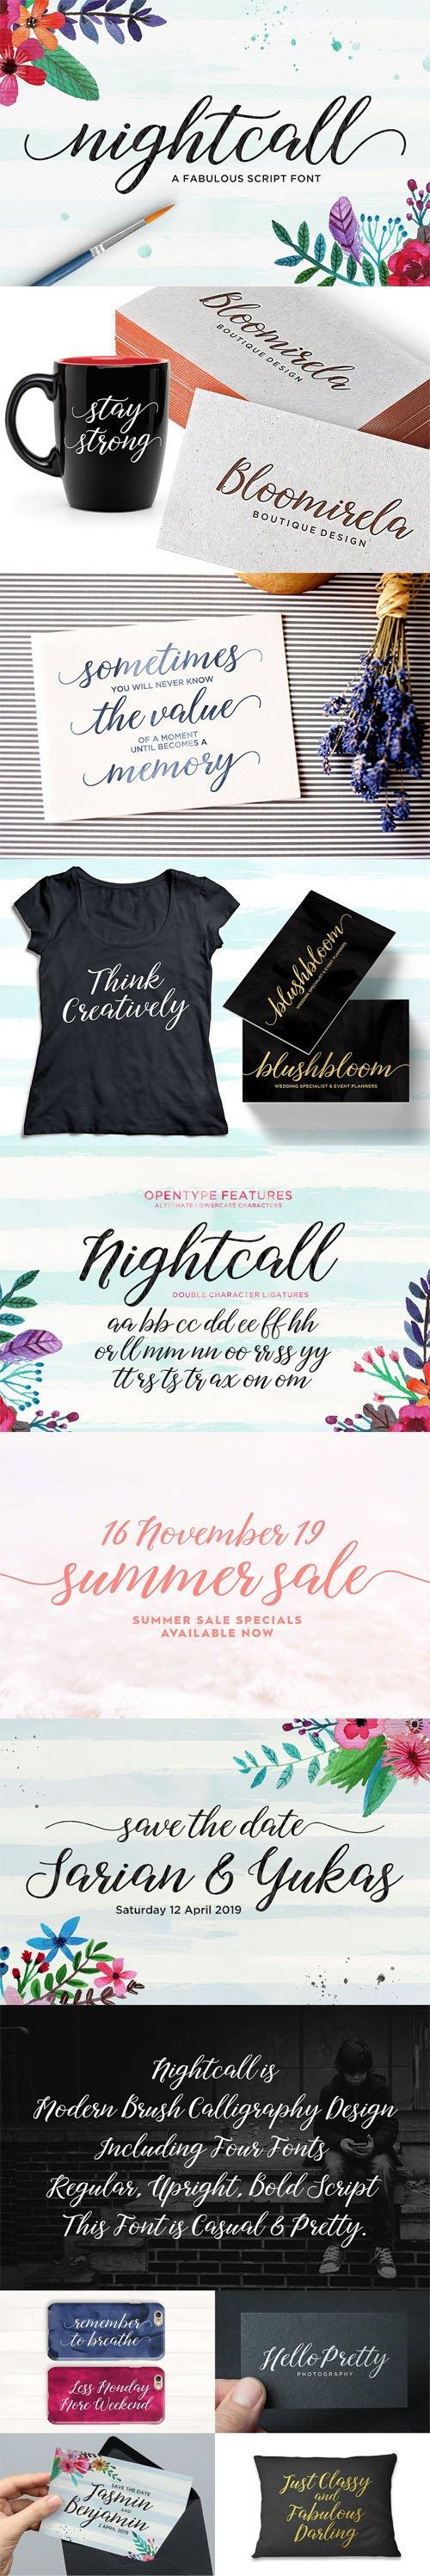 CM - Nightcall - Modern Calligraphy Script Font